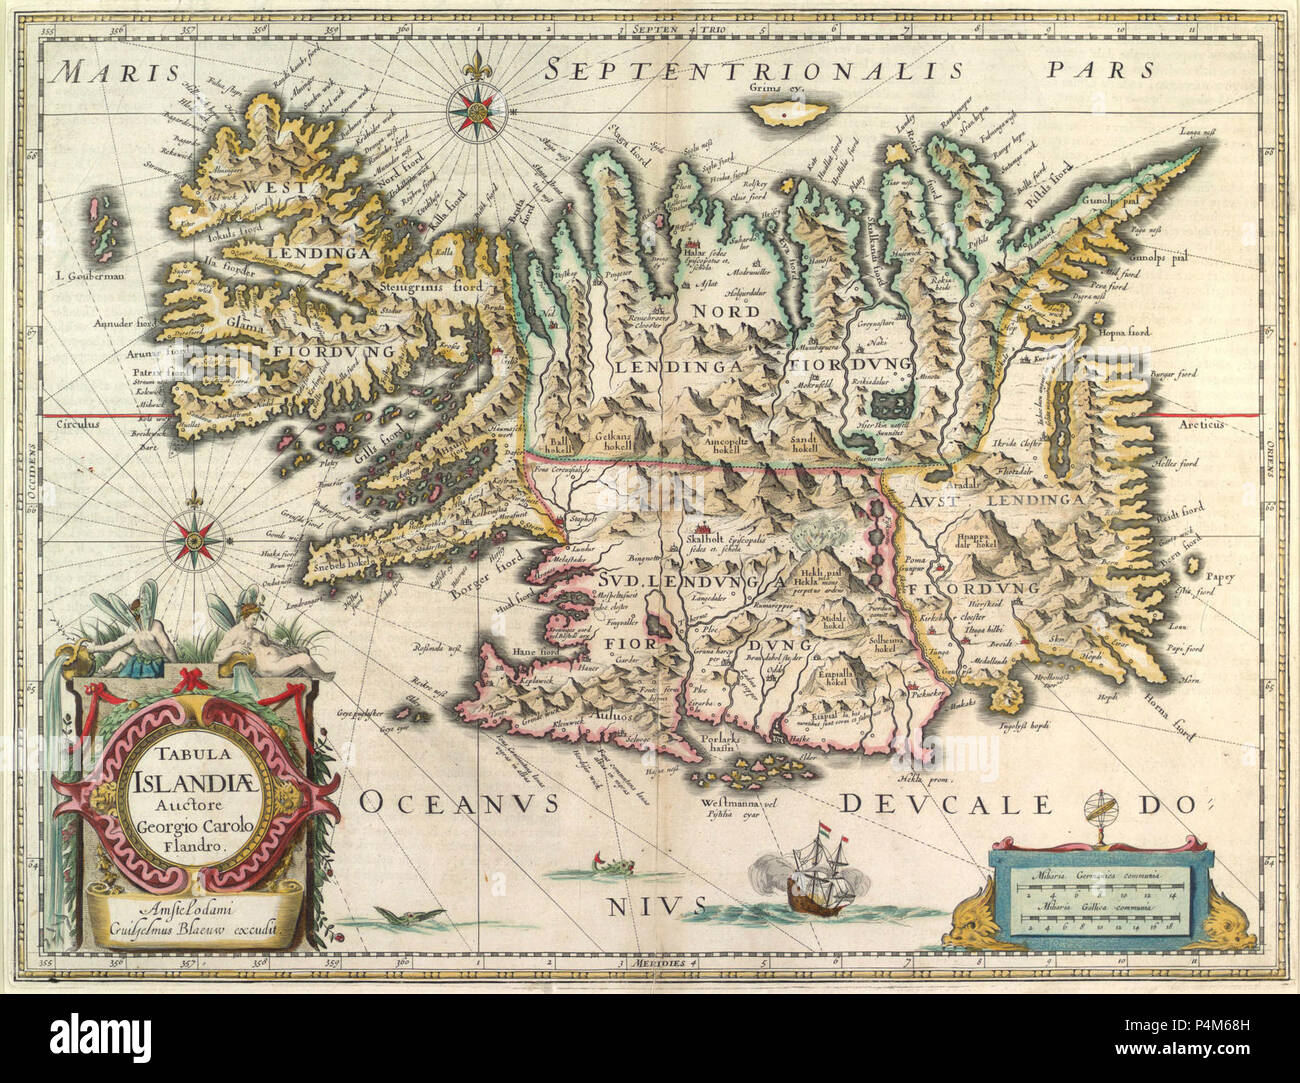 1630 IJsland Blaeu HR'. - Stock Image